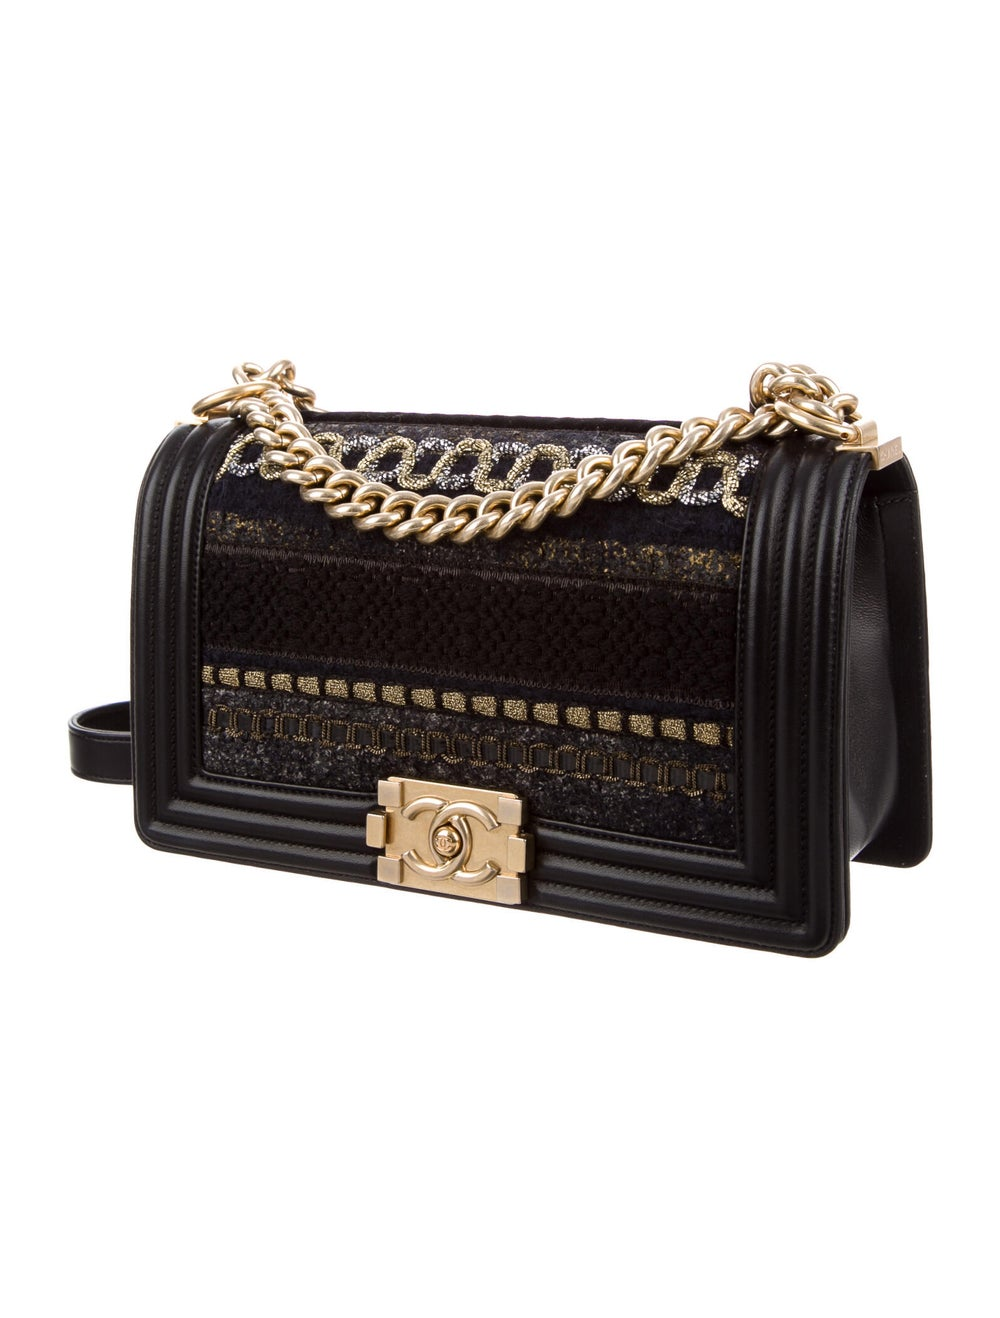 Chanel Medium Tweed Boy Bag Black - image 3